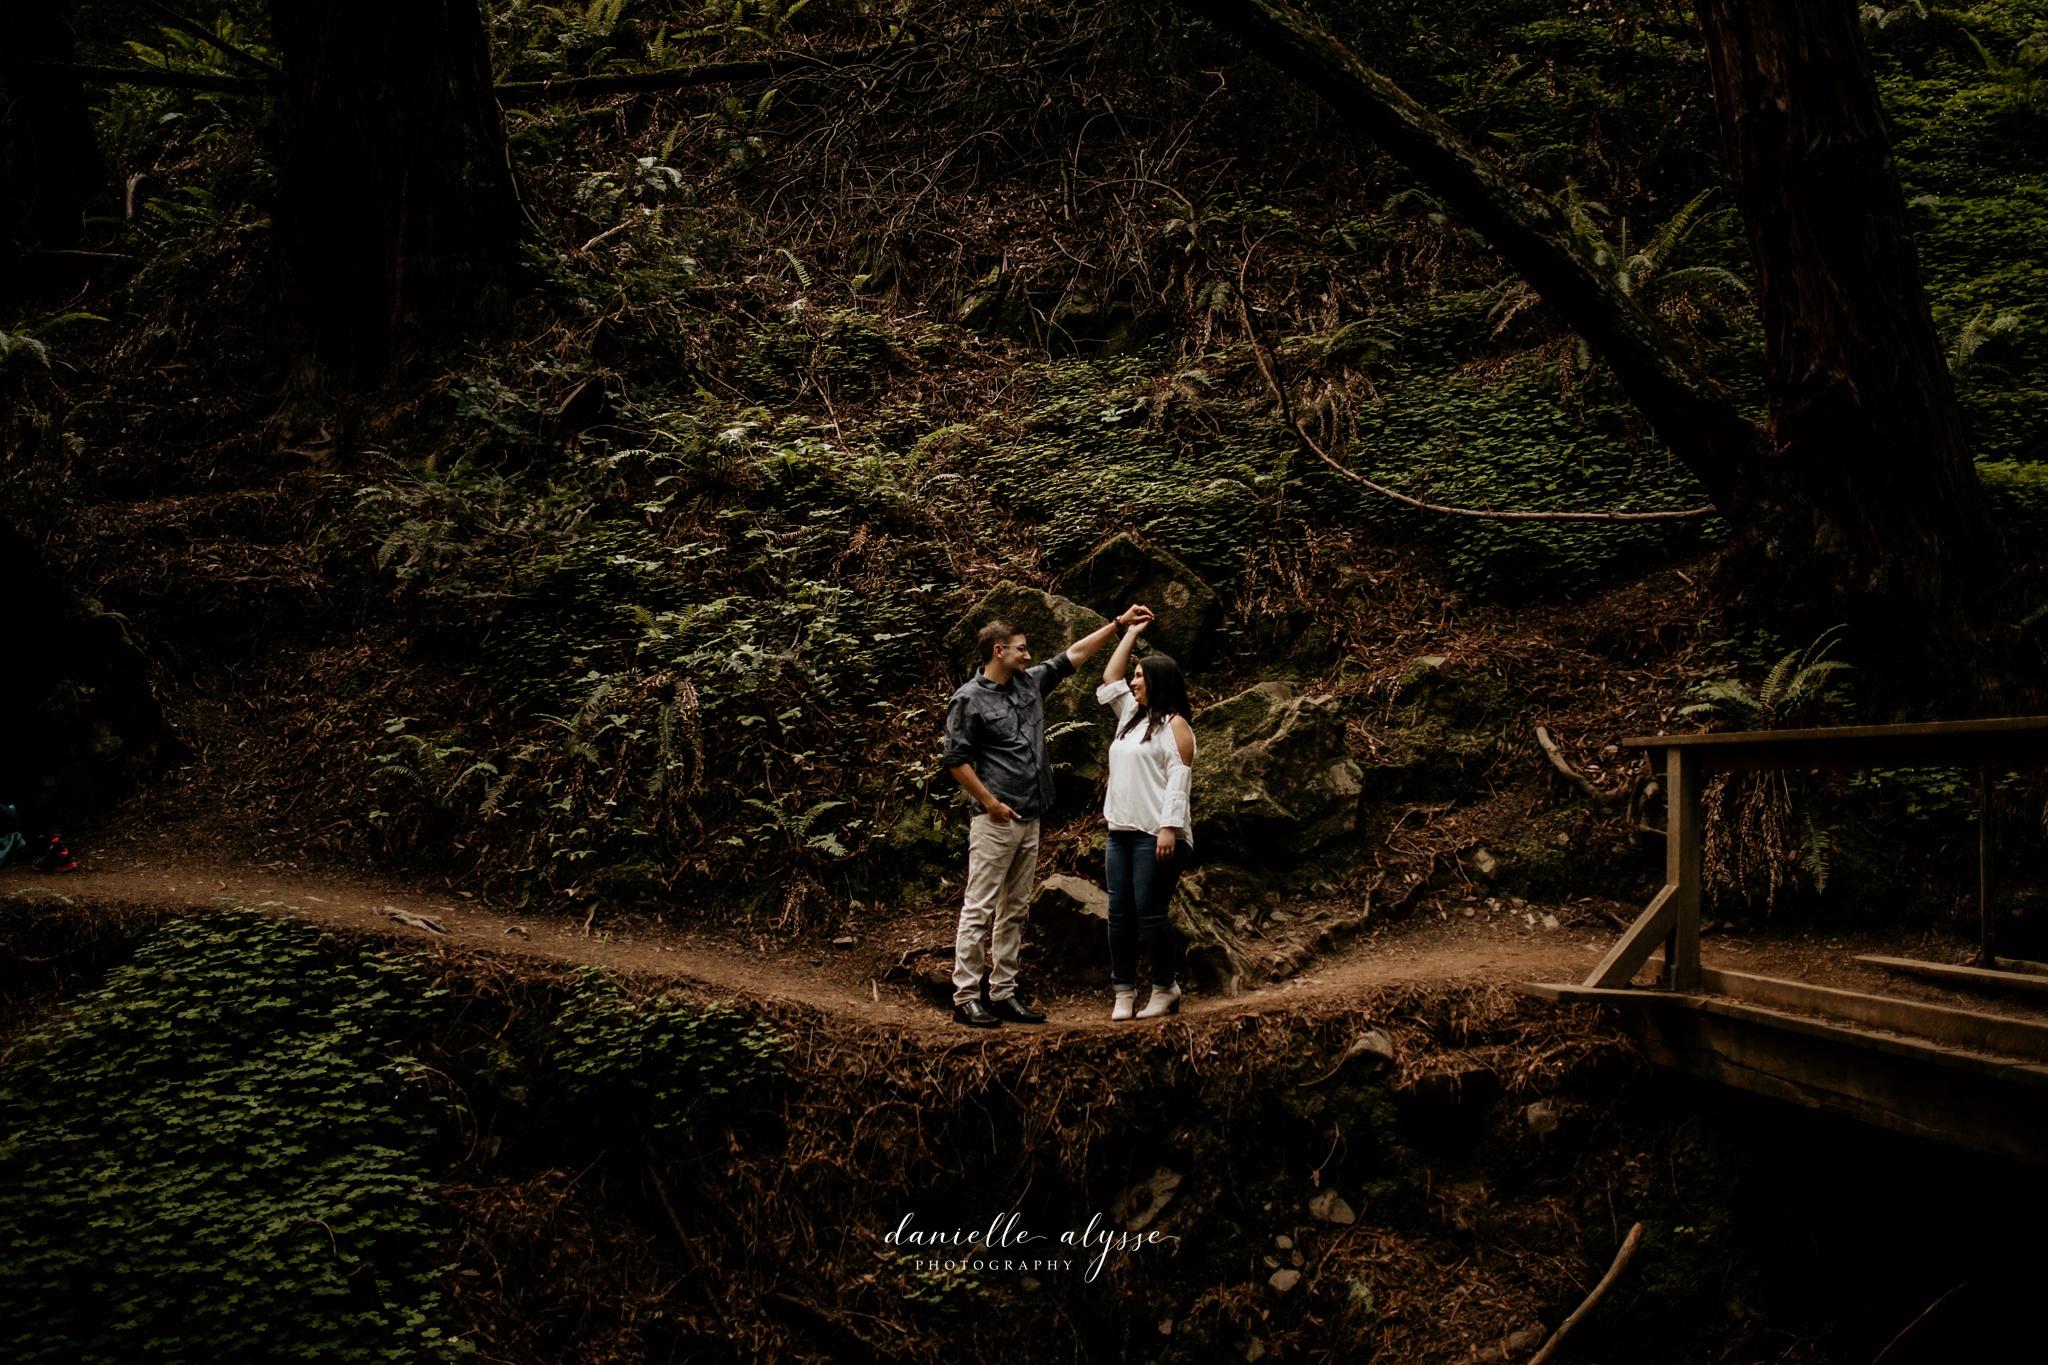 180503_engagement_bianca_muir_woods_mill_valley_danielle_alysse_photography_bay_area_photographer_blog_39_WEB.jpg